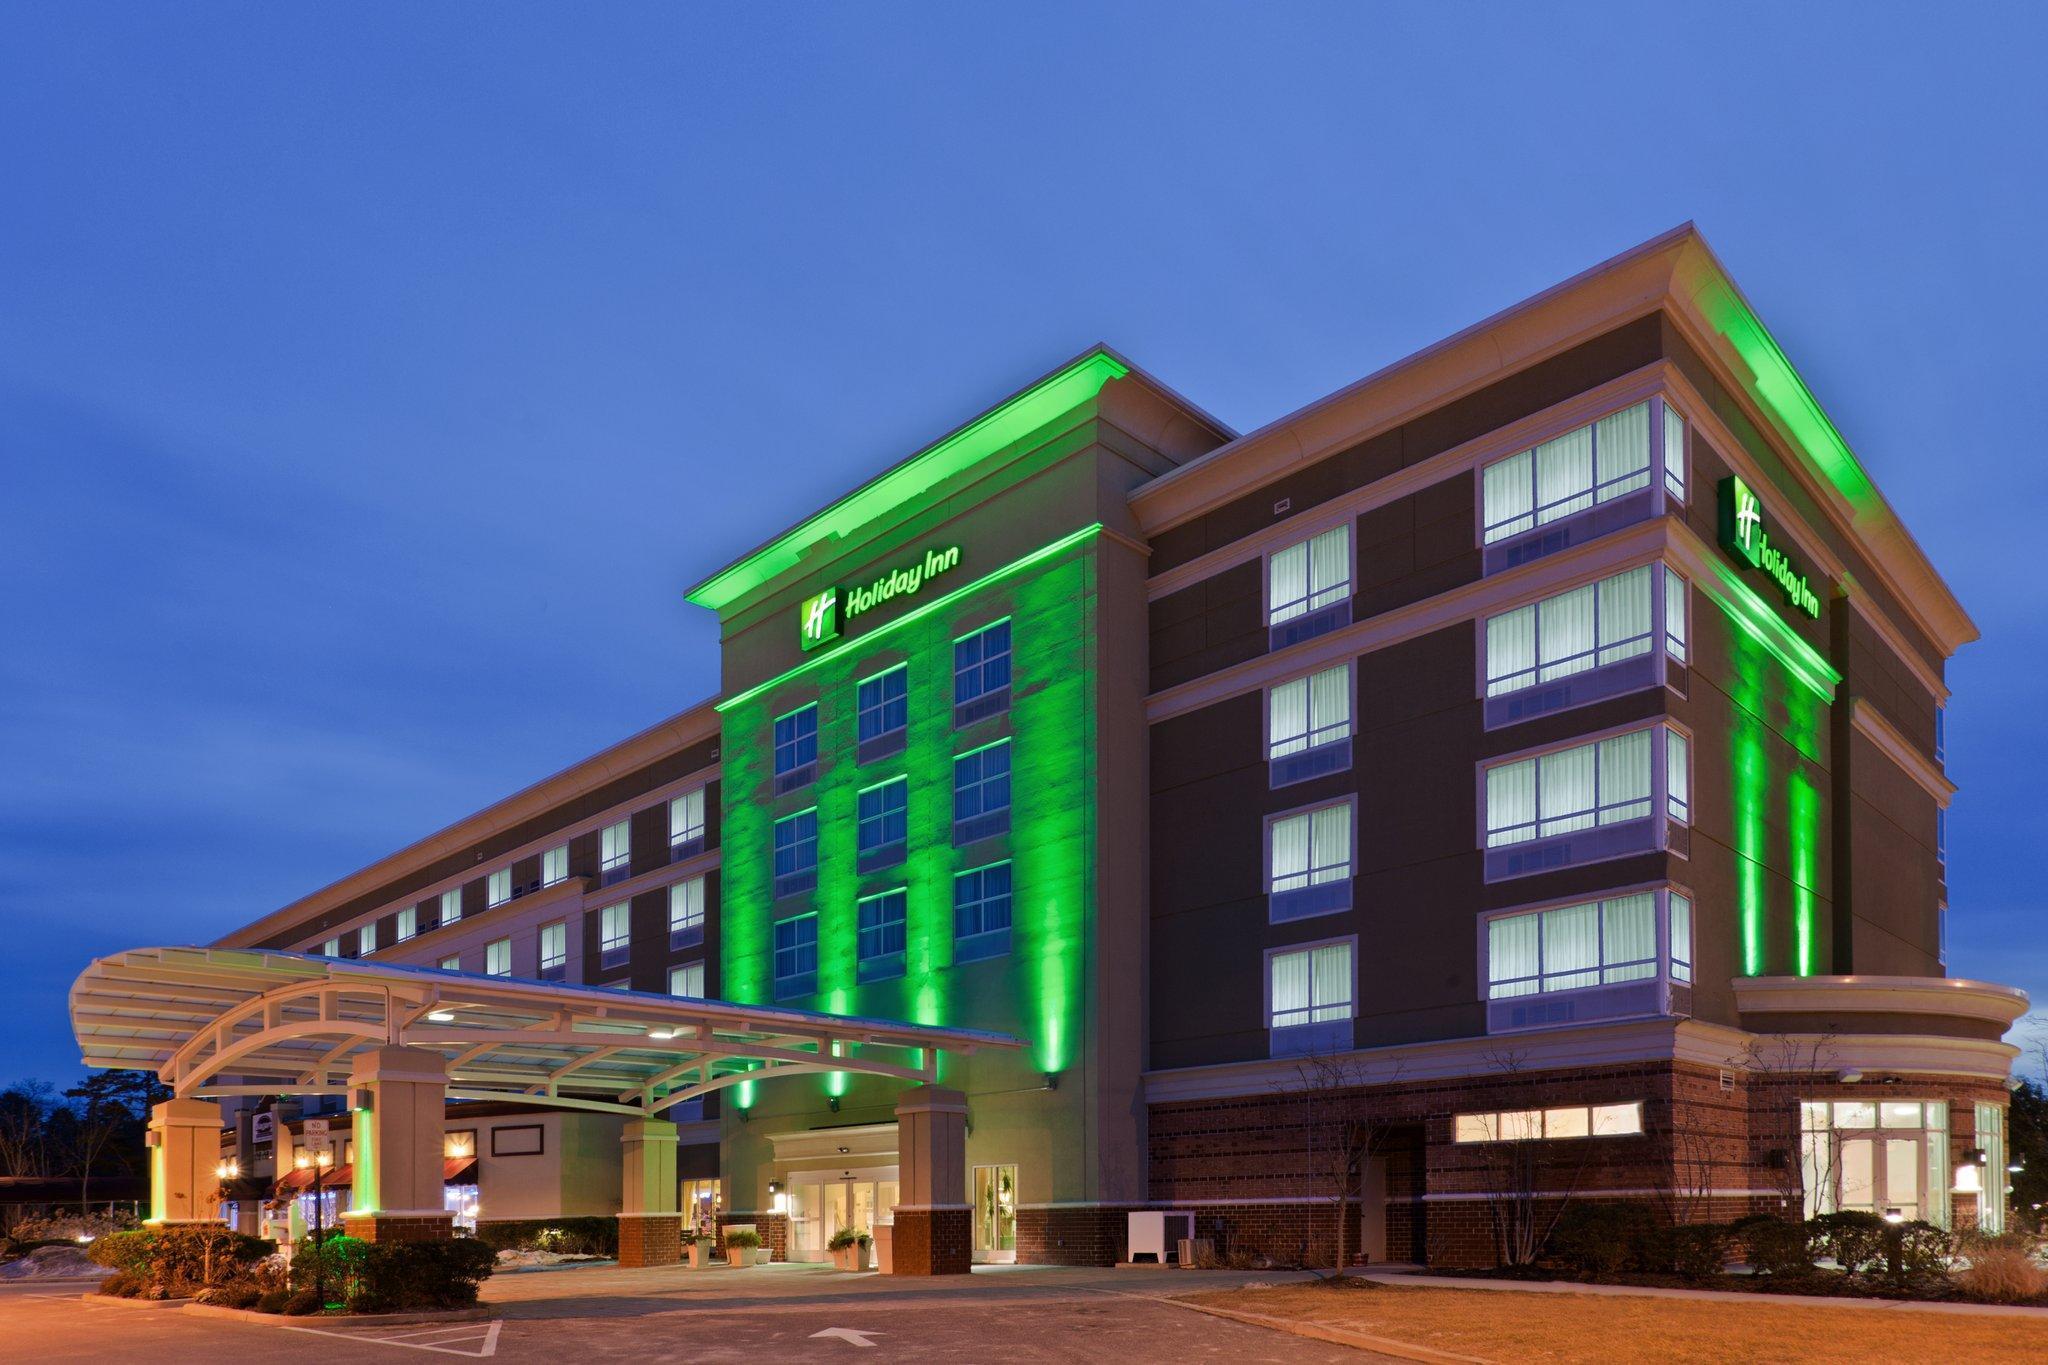 Holiday Inn Manahawkin Long Beach Island Hotel